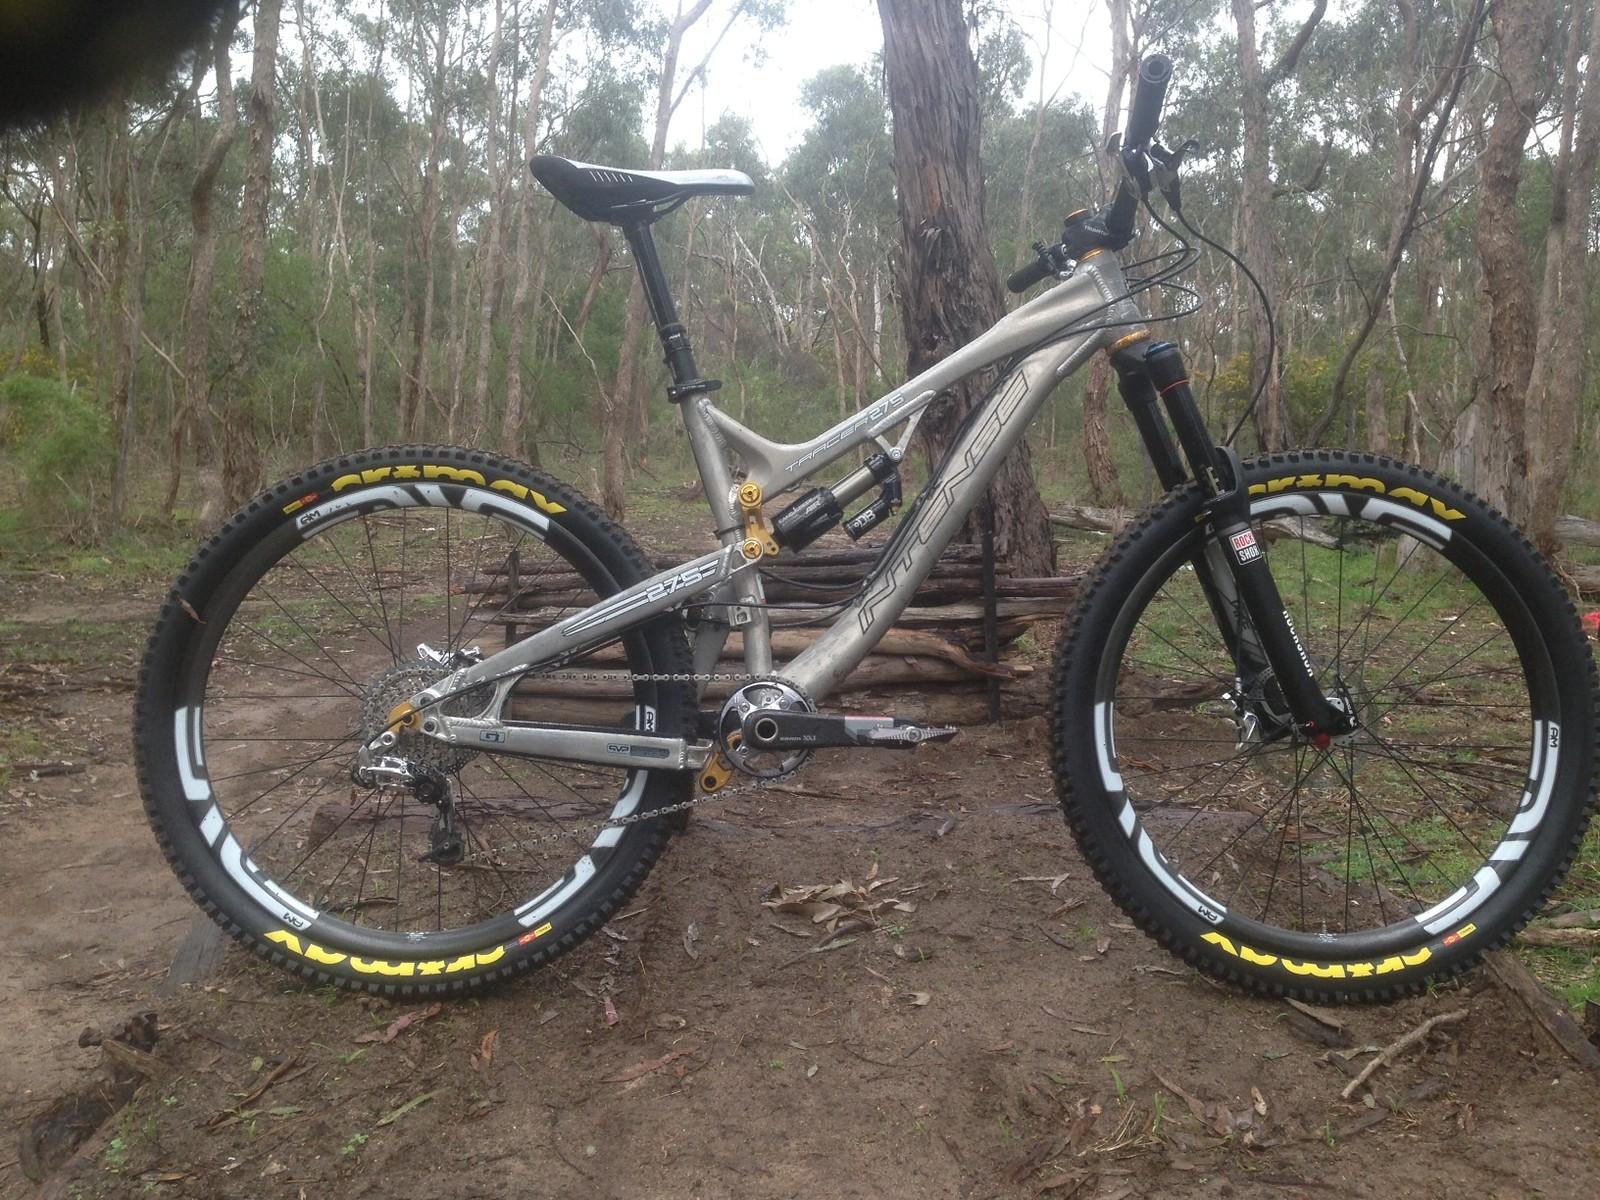 MoosyB's Tracer 275